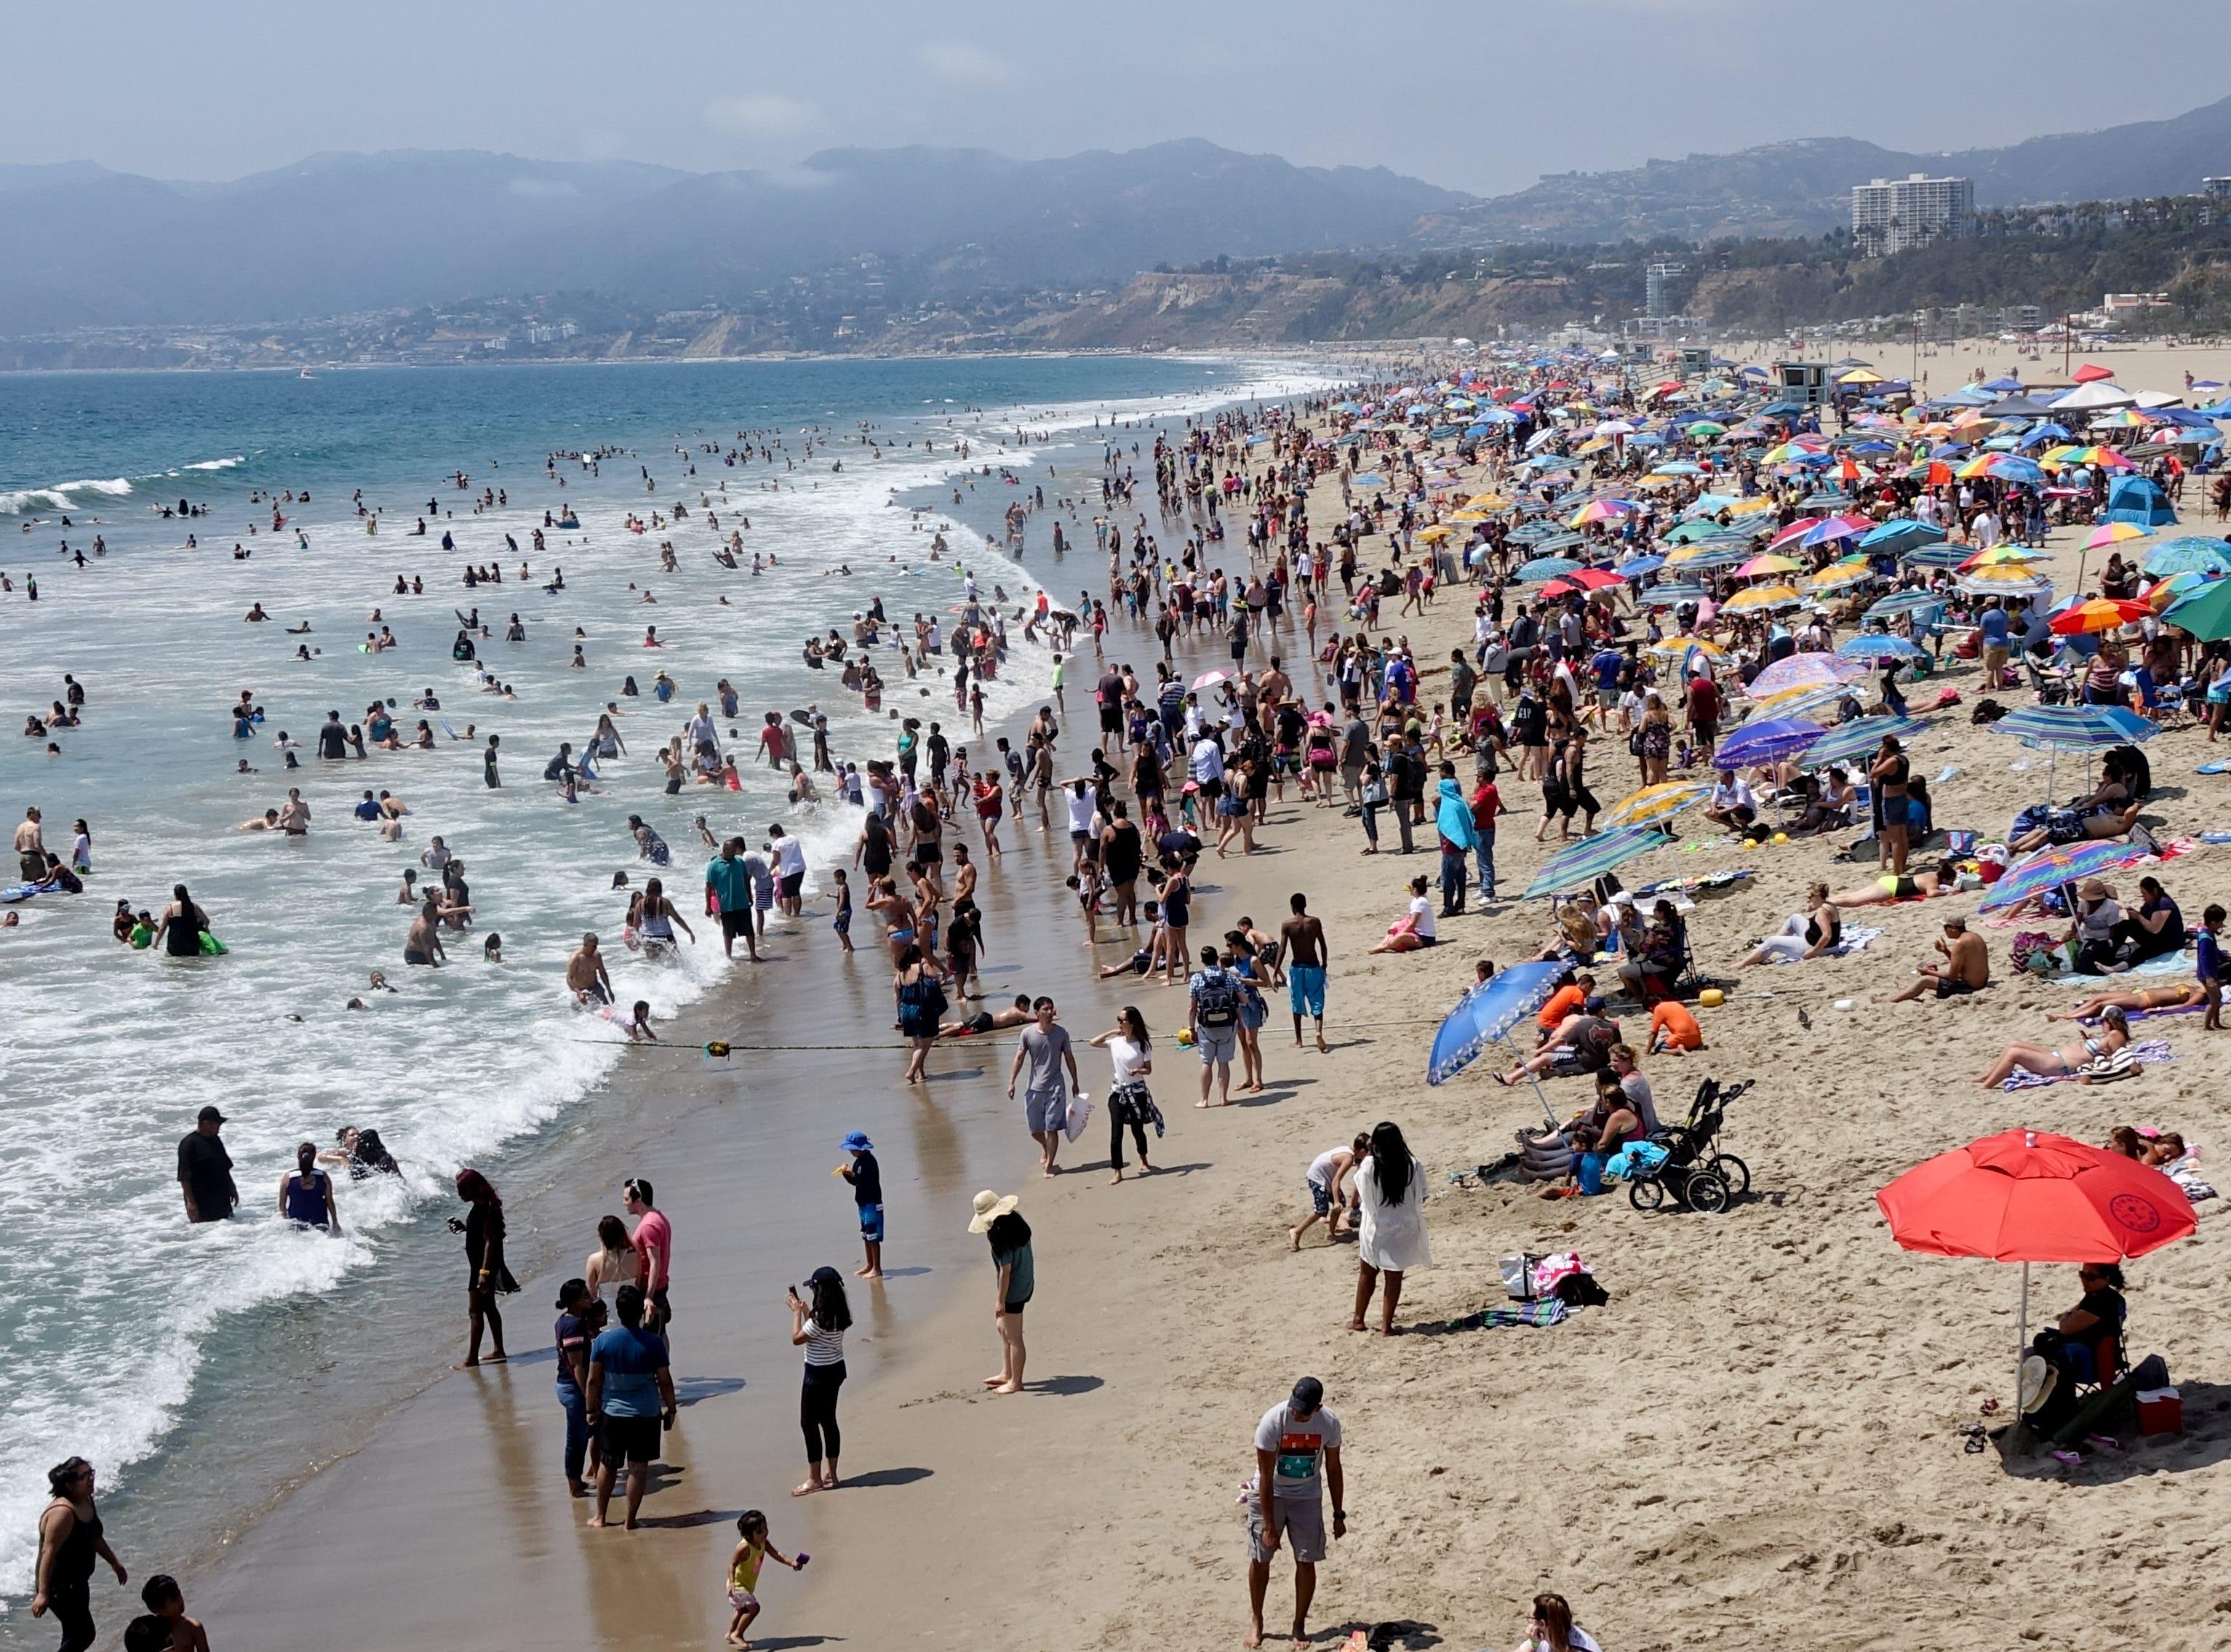 A crowded Saturday in Santa Monica